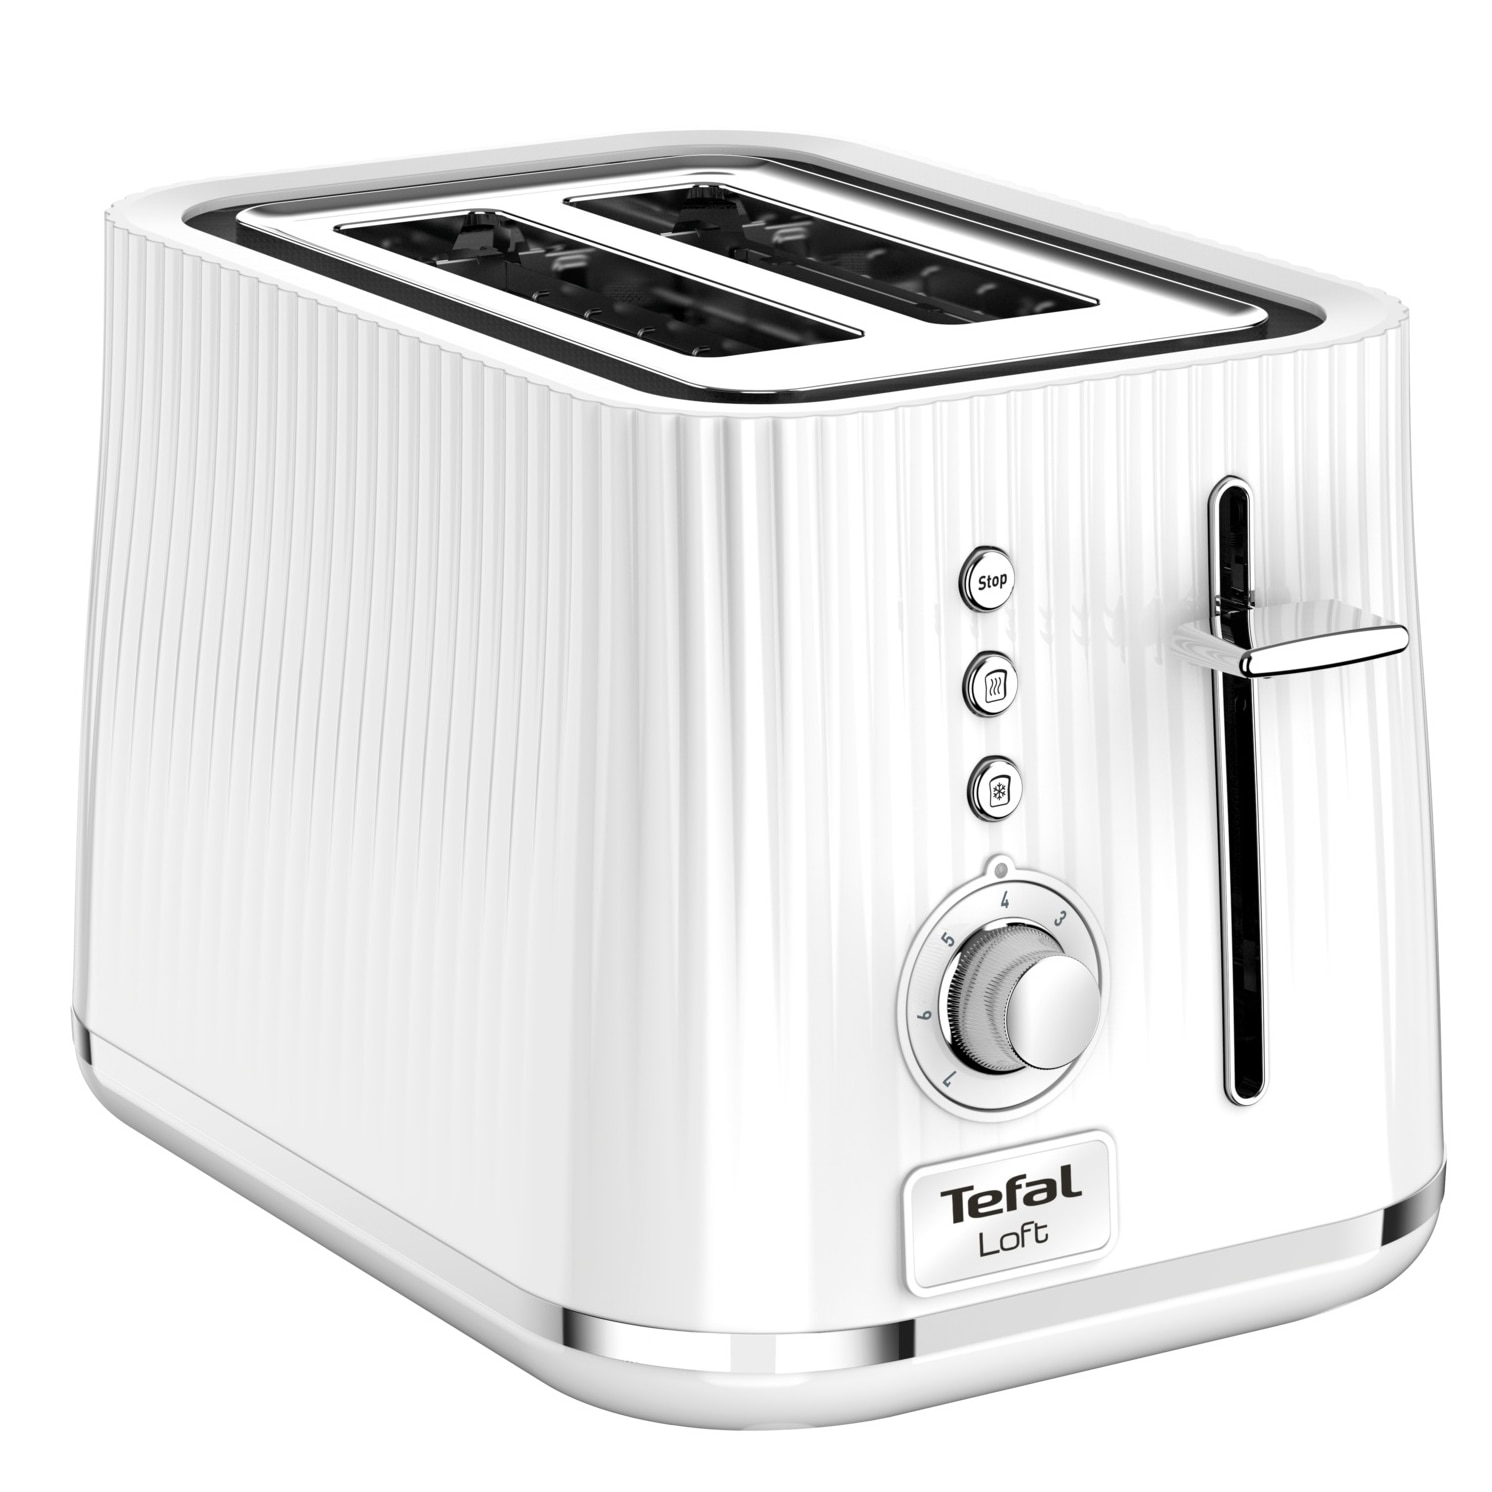 Fotografie Toaster TEFAL Loft TT761138, 7 niveluri de rumenire, 3 functii dedicate, iluminare LED, tava firmituri, alb